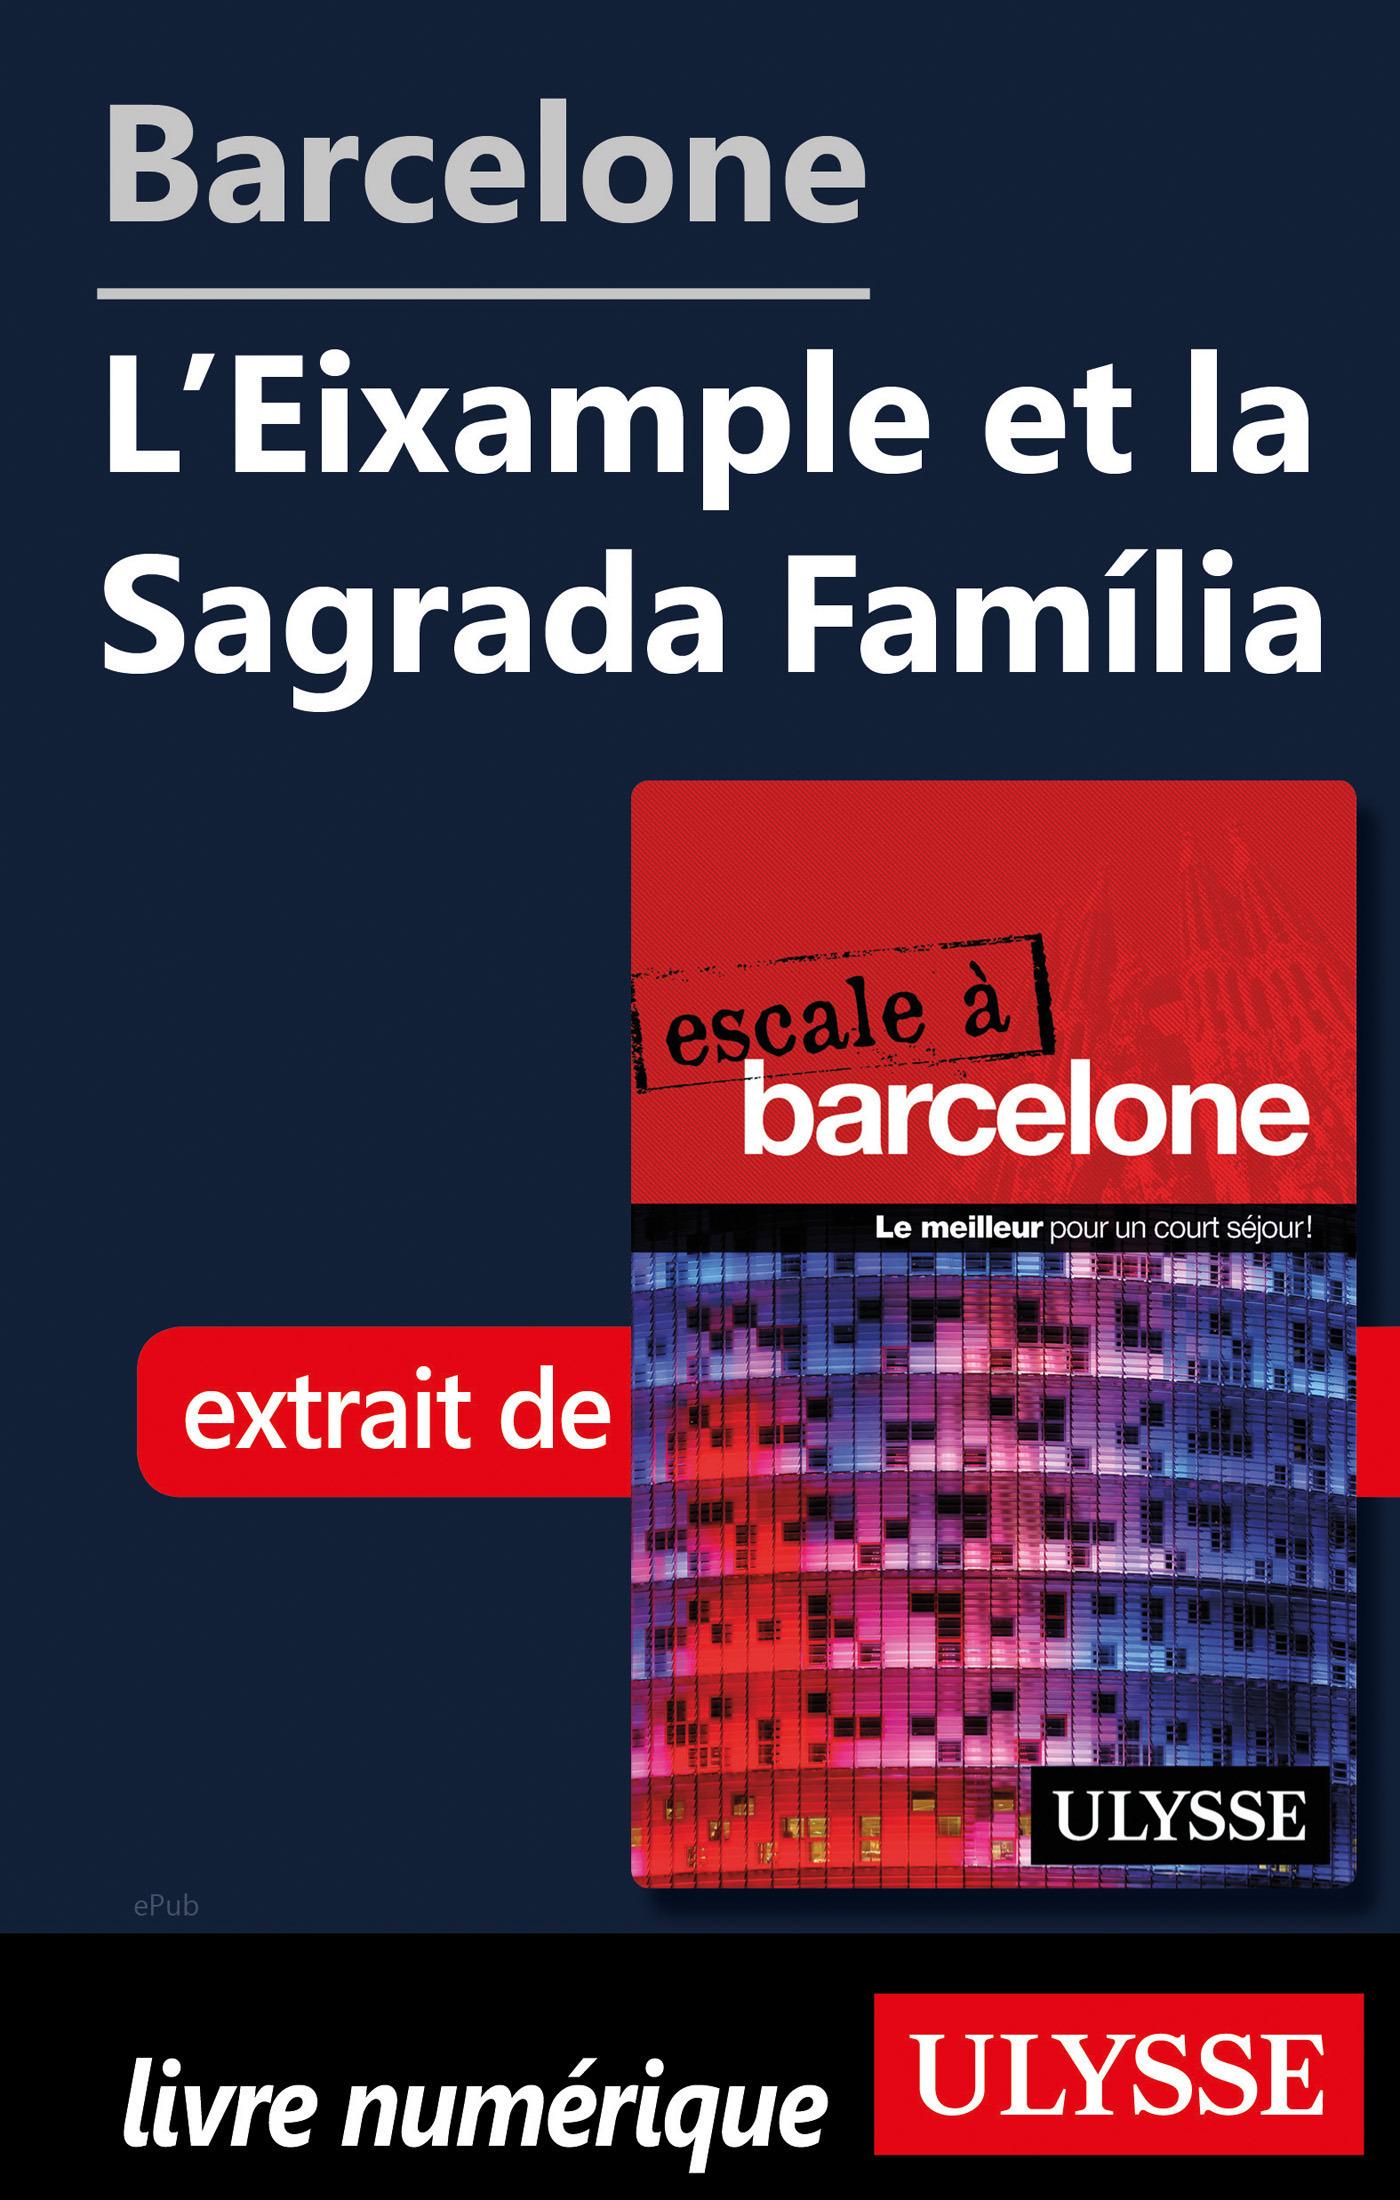 Barcelone - L'Eixample et la Sagrada Familia